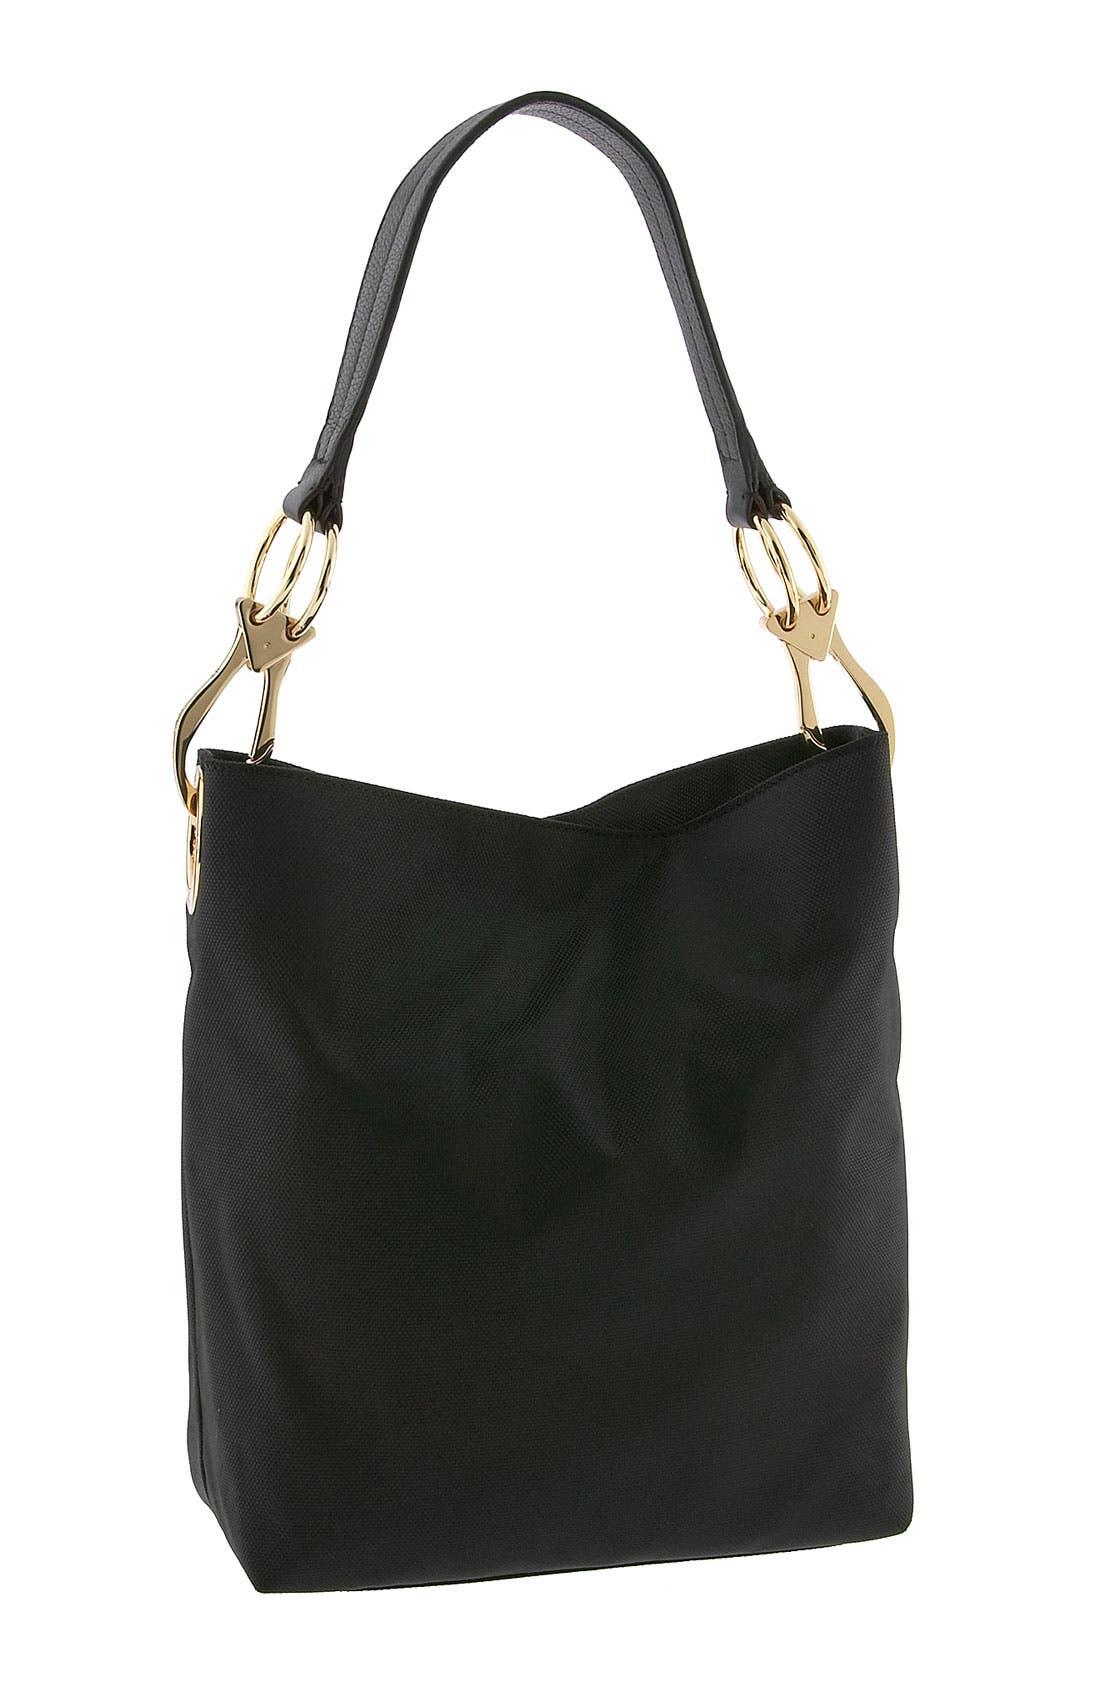 JPK PARIS Nylon Shoulder Bag with Chunky Hardware, Main, color, 001